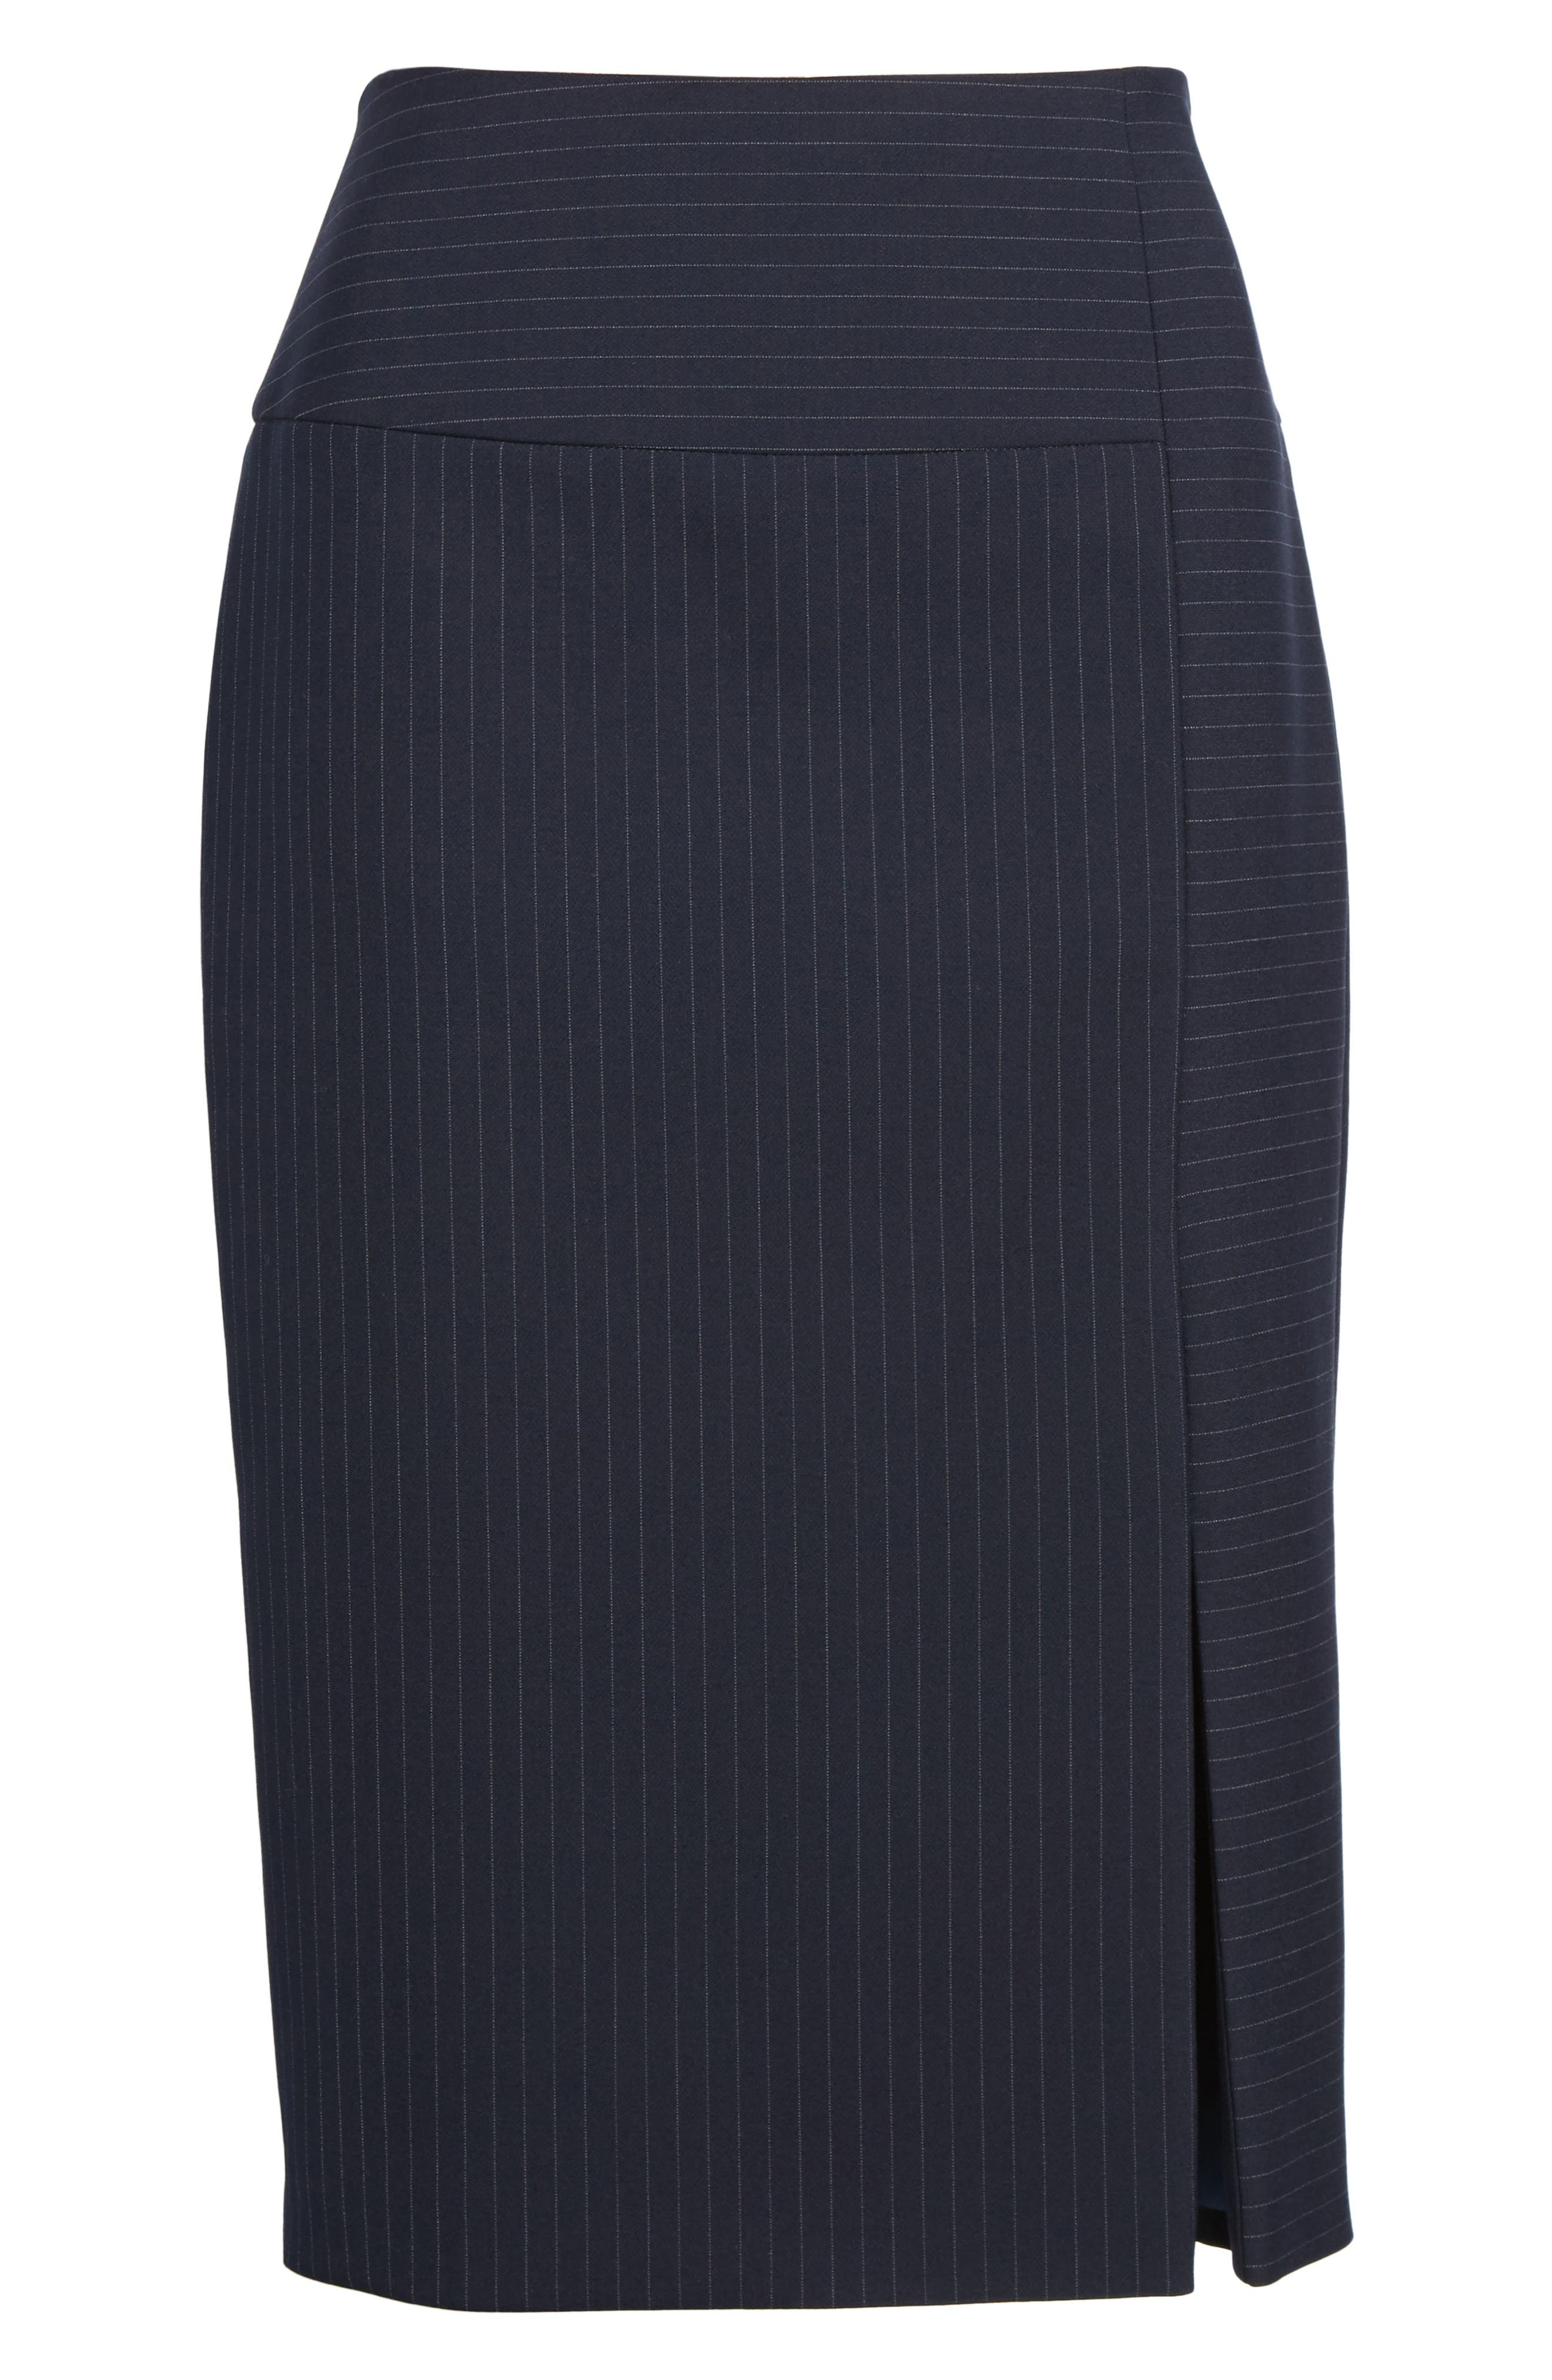 Vispana Pinstripe Suit Skirt,                             Alternate thumbnail 7, color,                             Nautical Fantasy